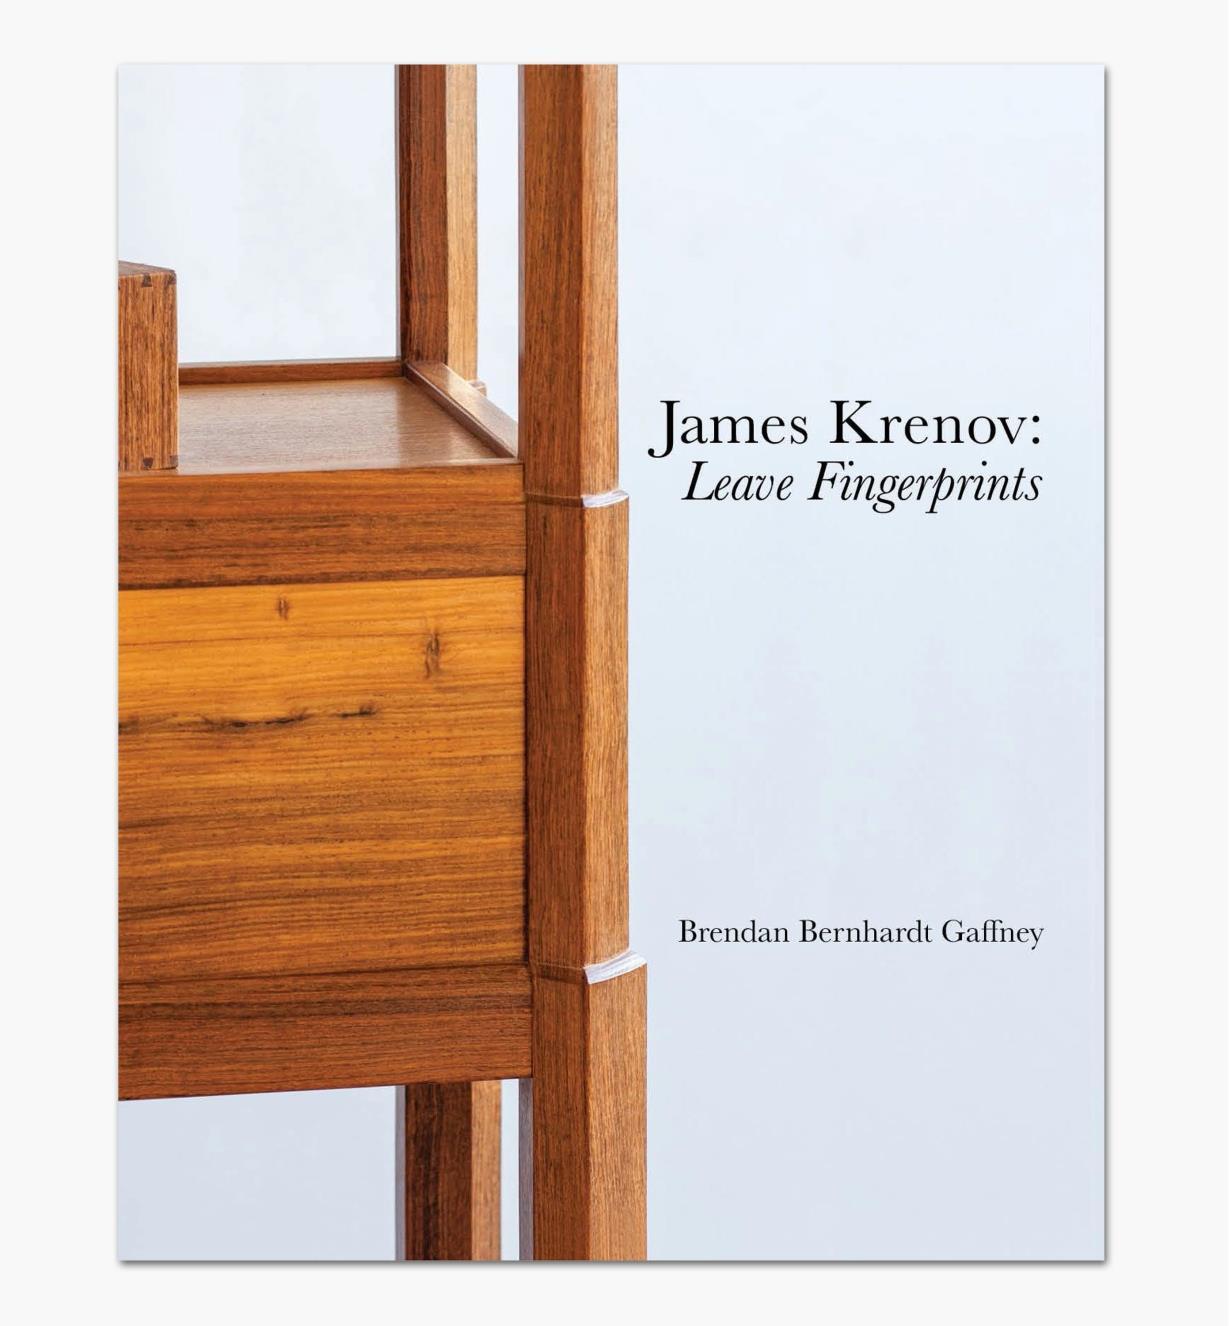 20L0371 - James Krenov: Leave Fingerprints